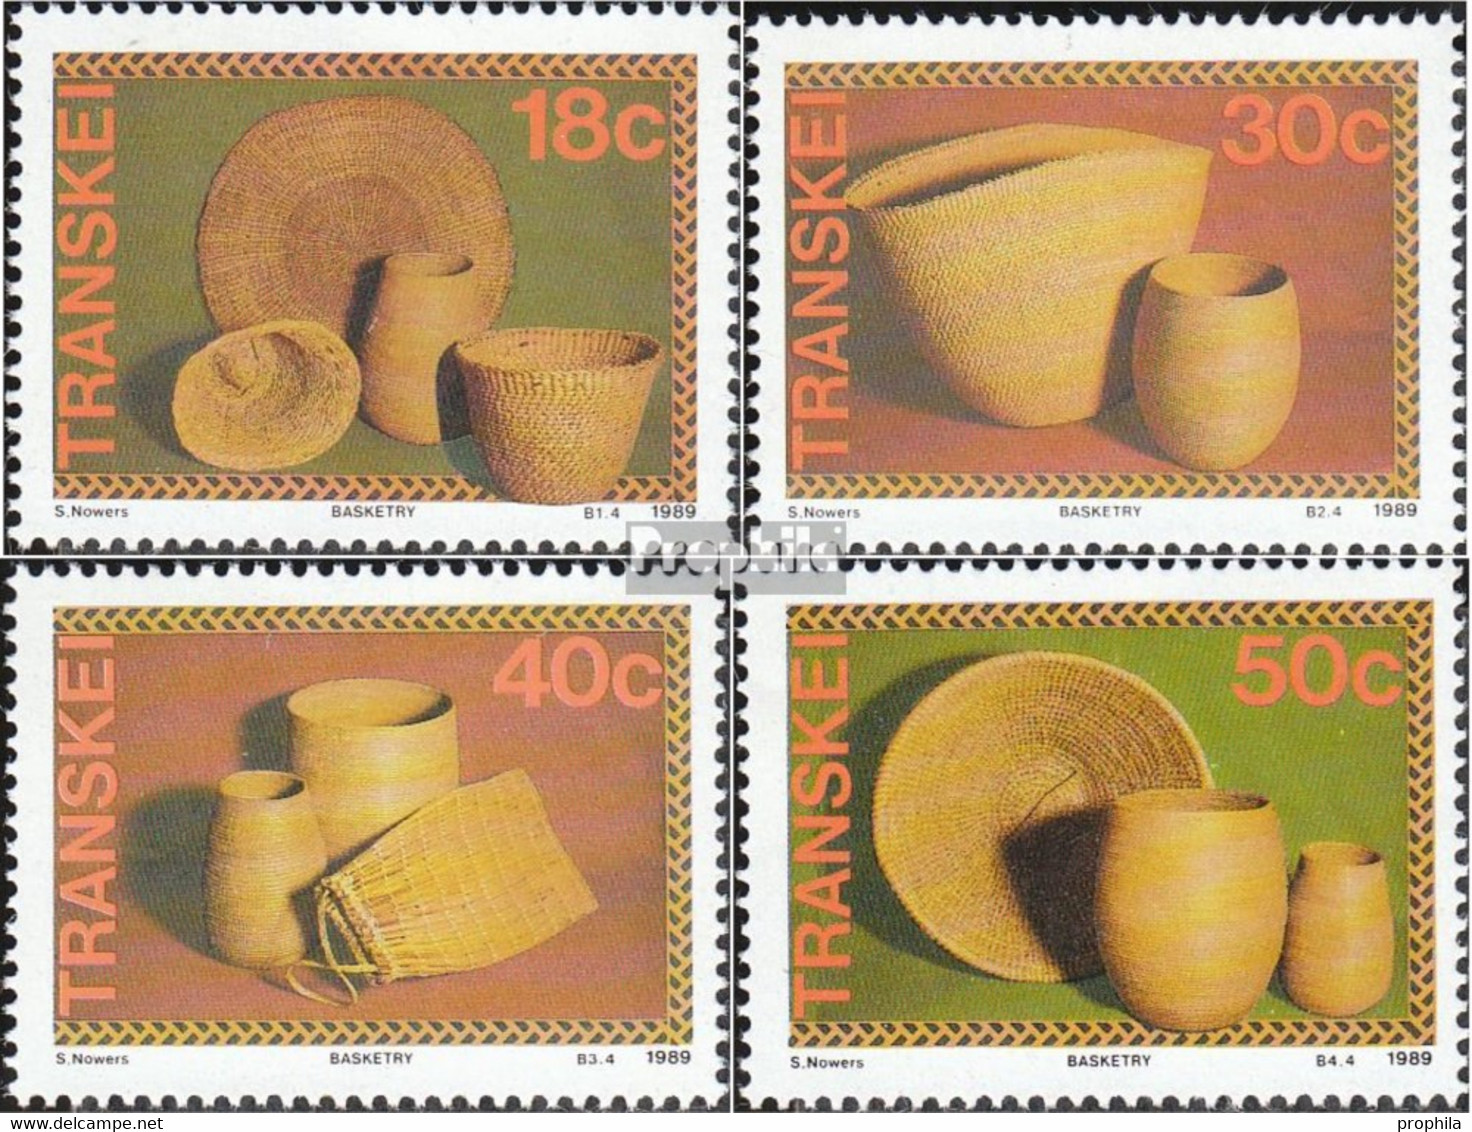 Südafrika - Transkei 234-237 (kompl.Ausg.) Postfrisch 1989 Korbwaren - Transkei